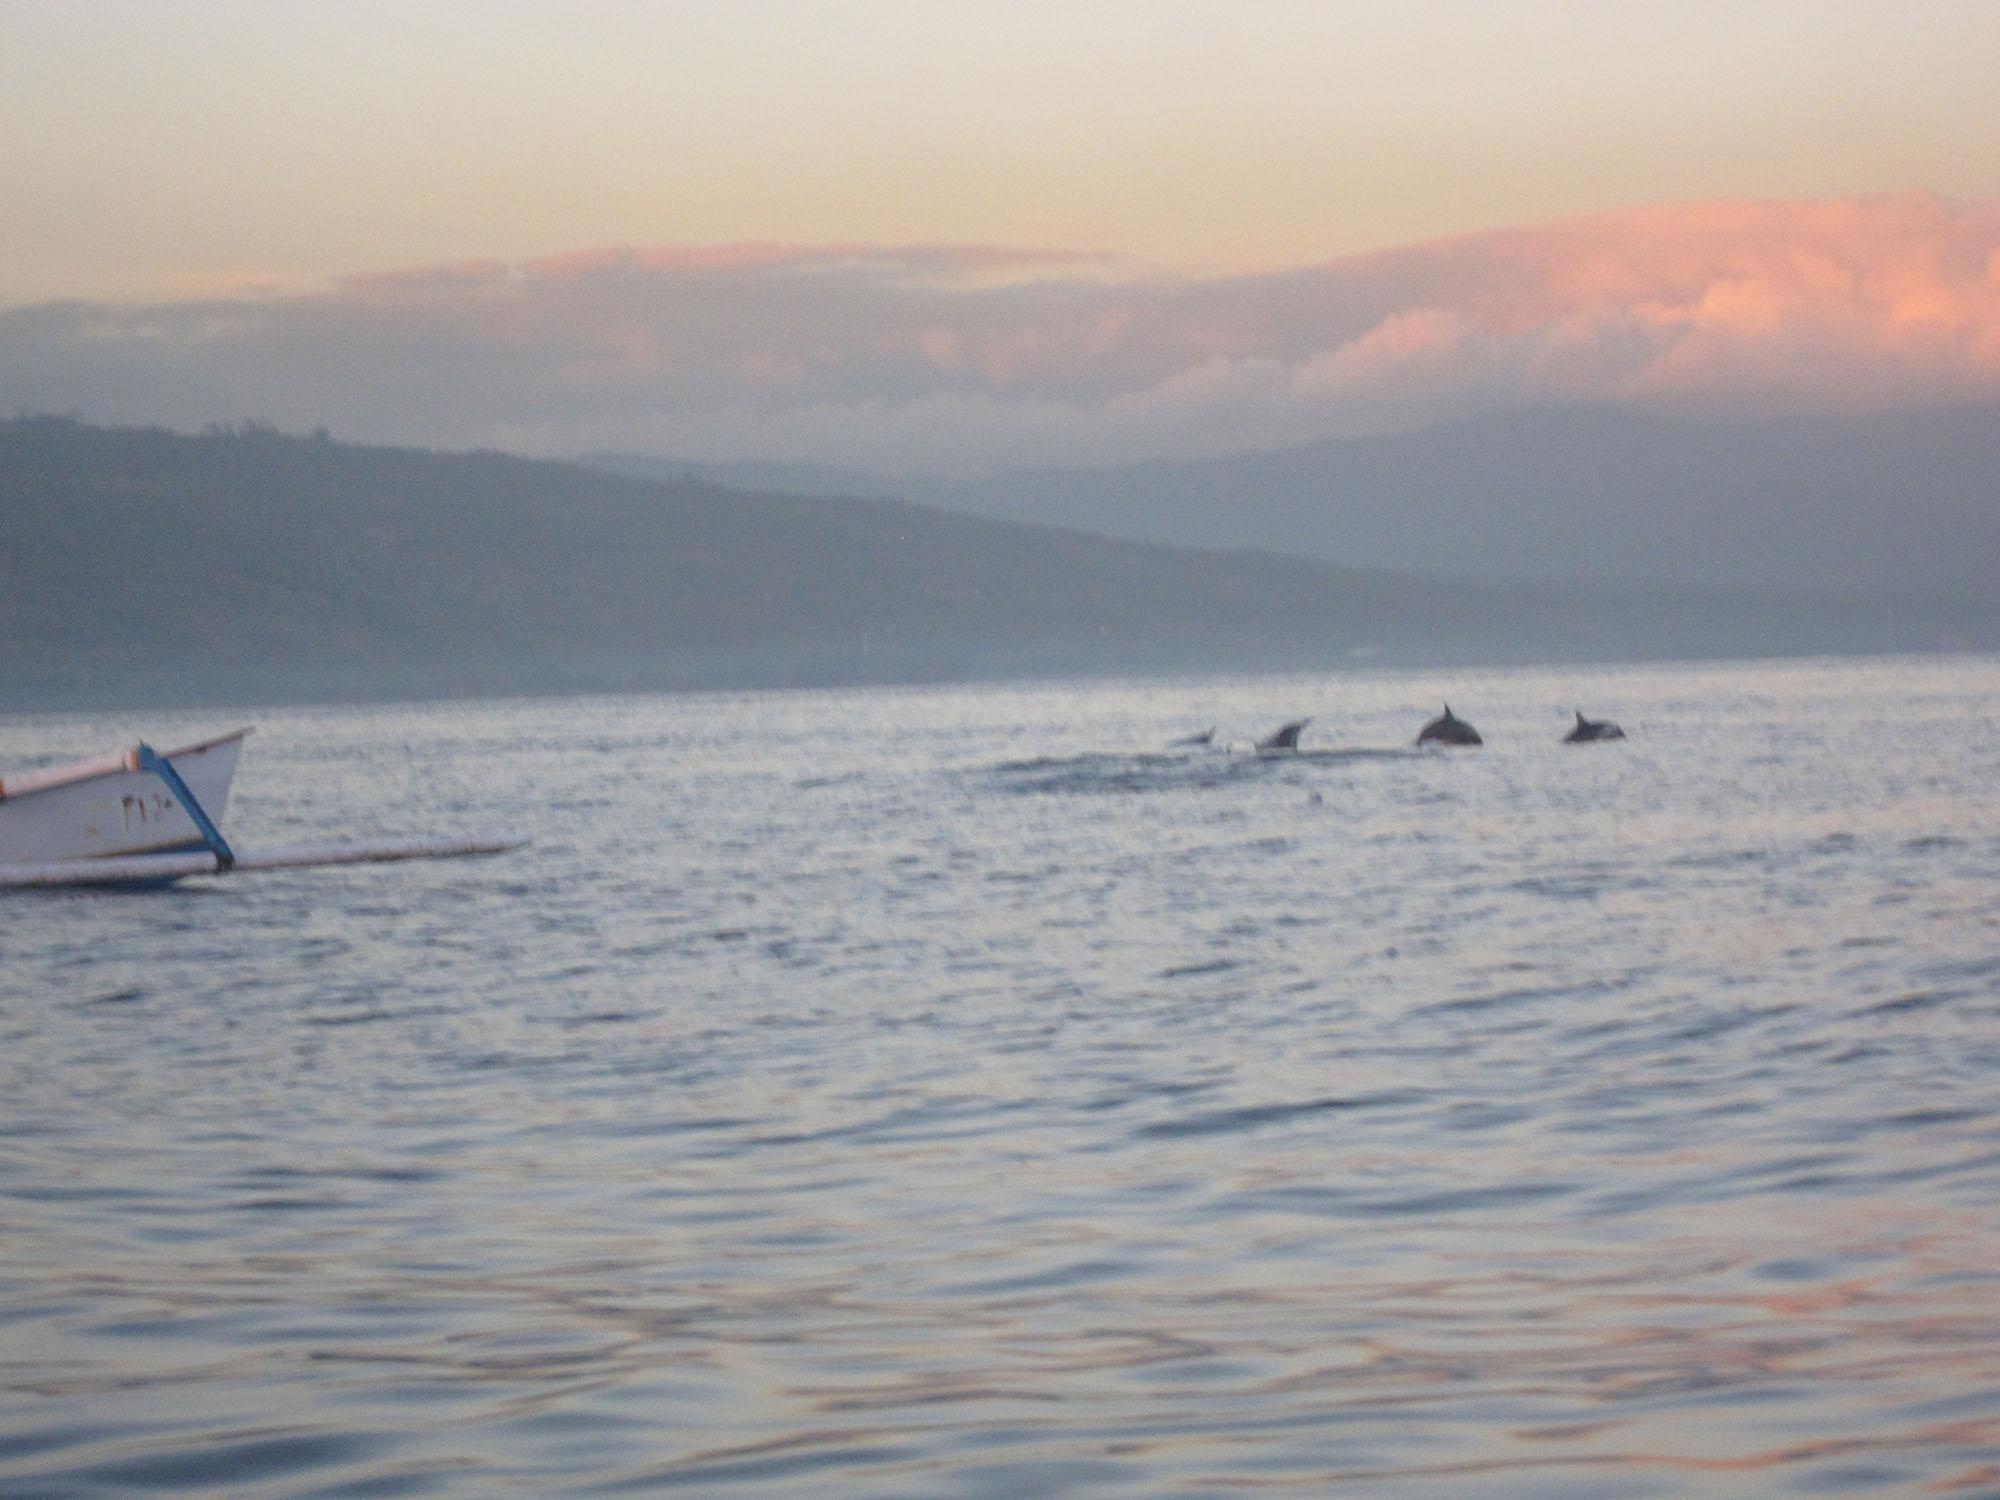 Lovina Beach Dolphin watching in Lovina, Bali, Indonesia